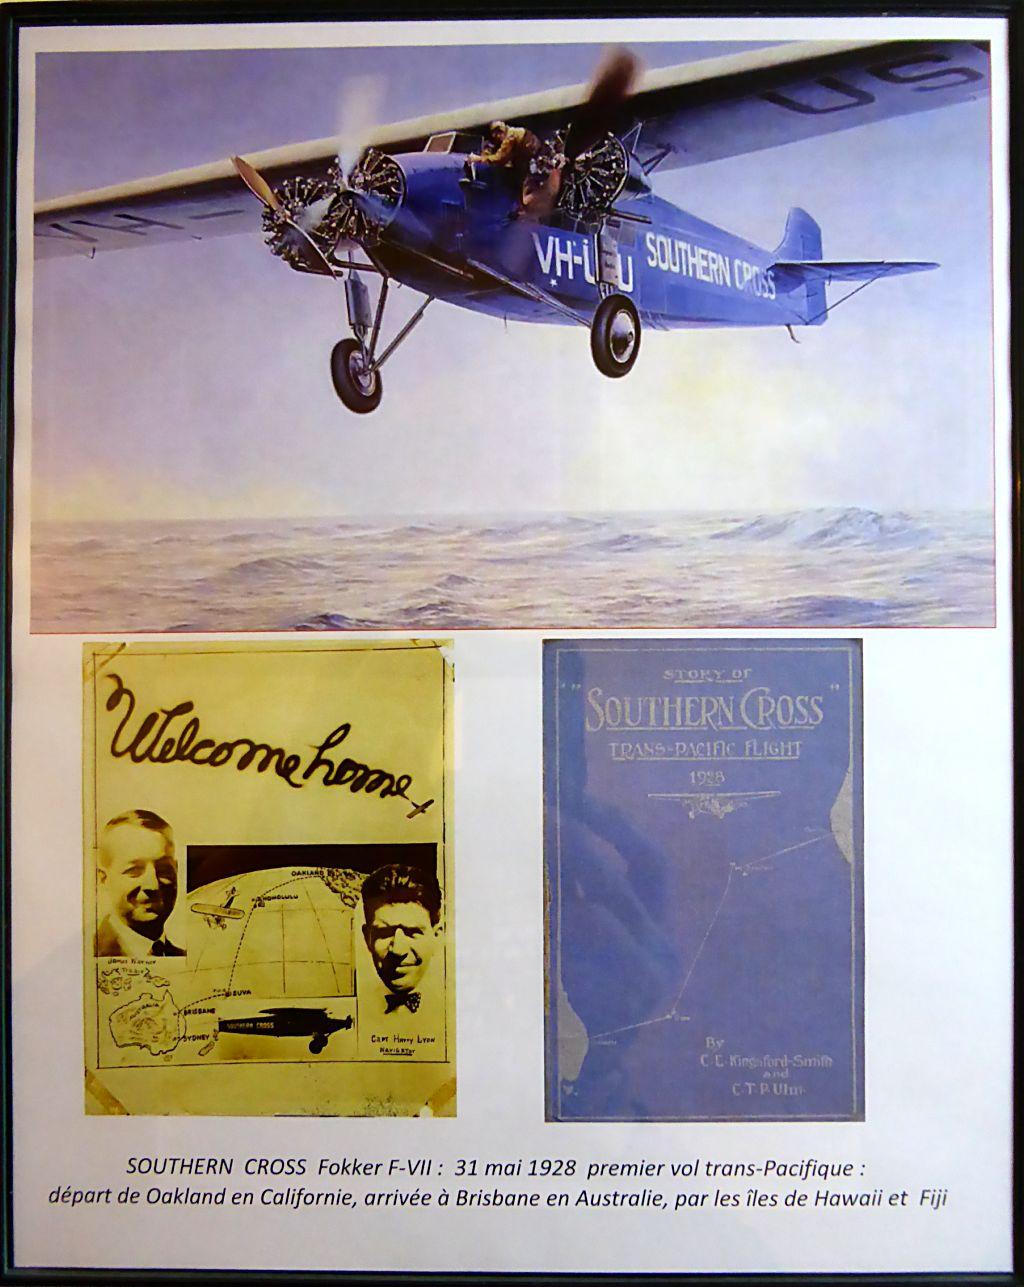 "[Zvesda] - Fokker F-VII ""SOUTHERN CROSS"" 1928 Vol Trans-Pacifique vers l'Australie Fvii-610"